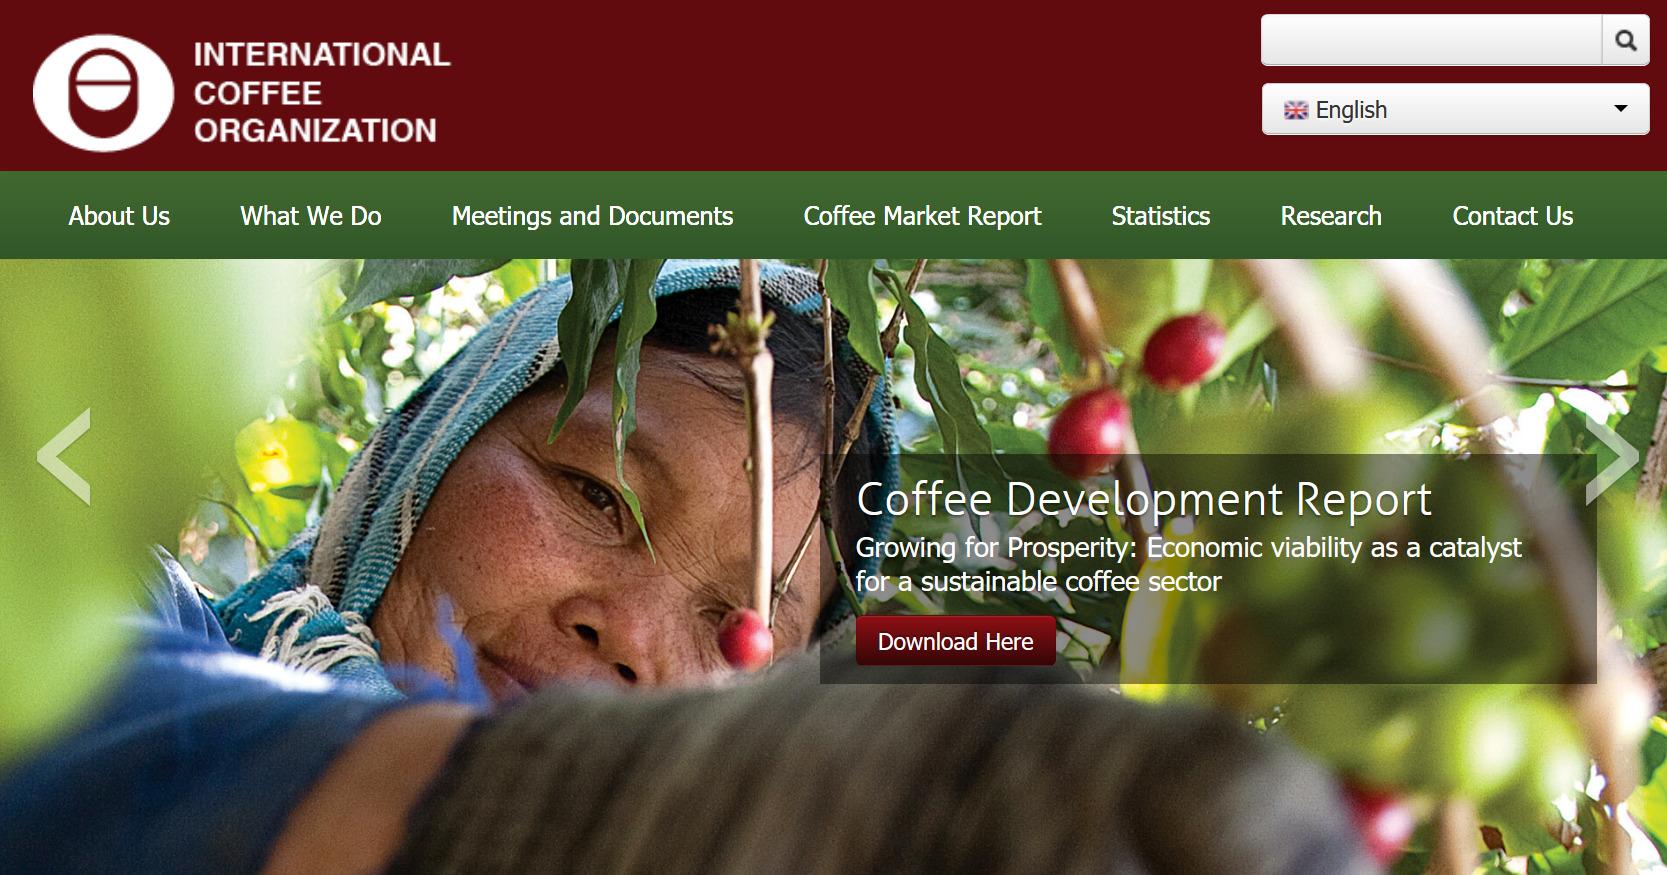 Die Internationale Kaffeeorganisation I.C.O.